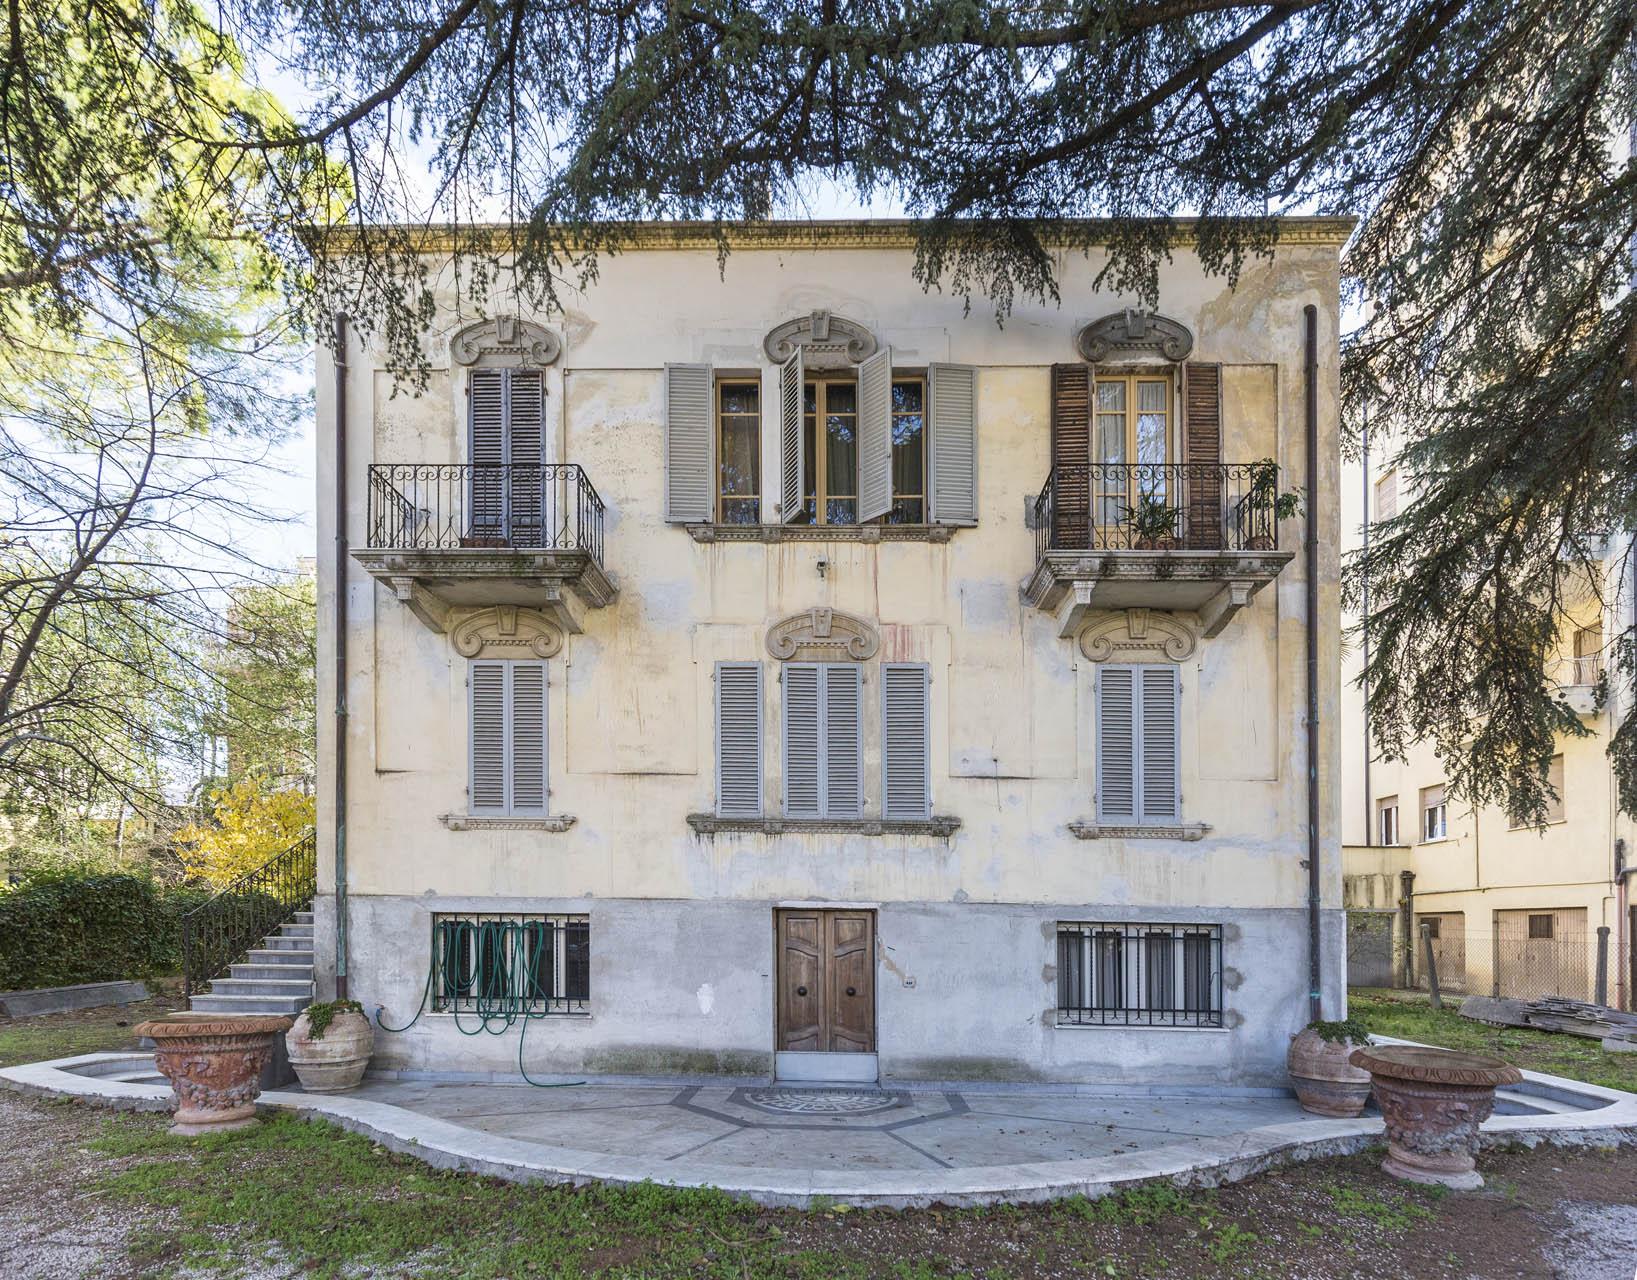 Beautiful Terrazza Liberty Foligno Images - Casa & Design 2018 ...